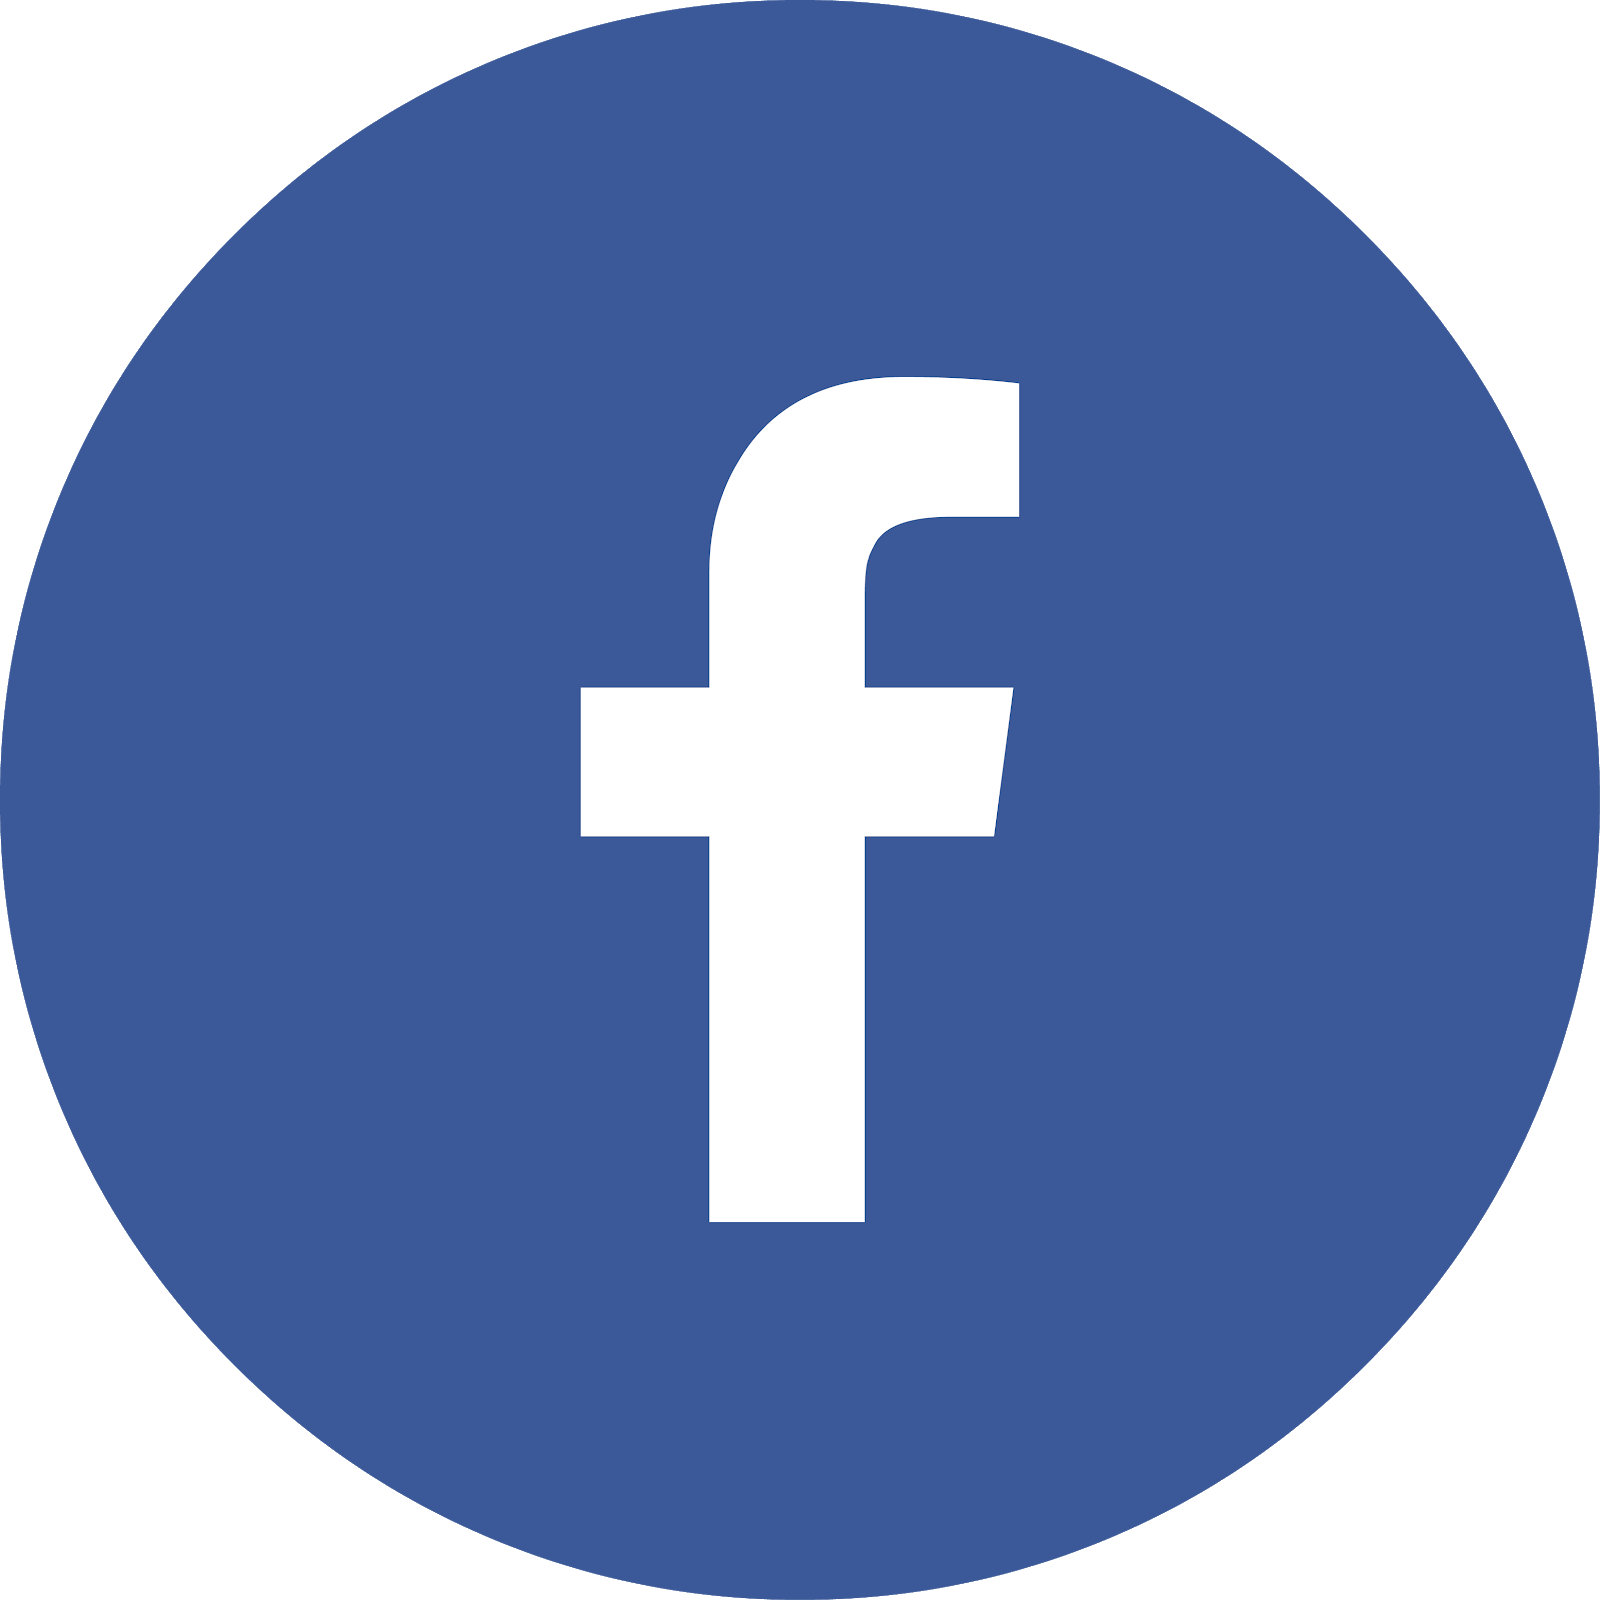 Facebook - Facebook Icon Circle Svg (470x470), Png Download